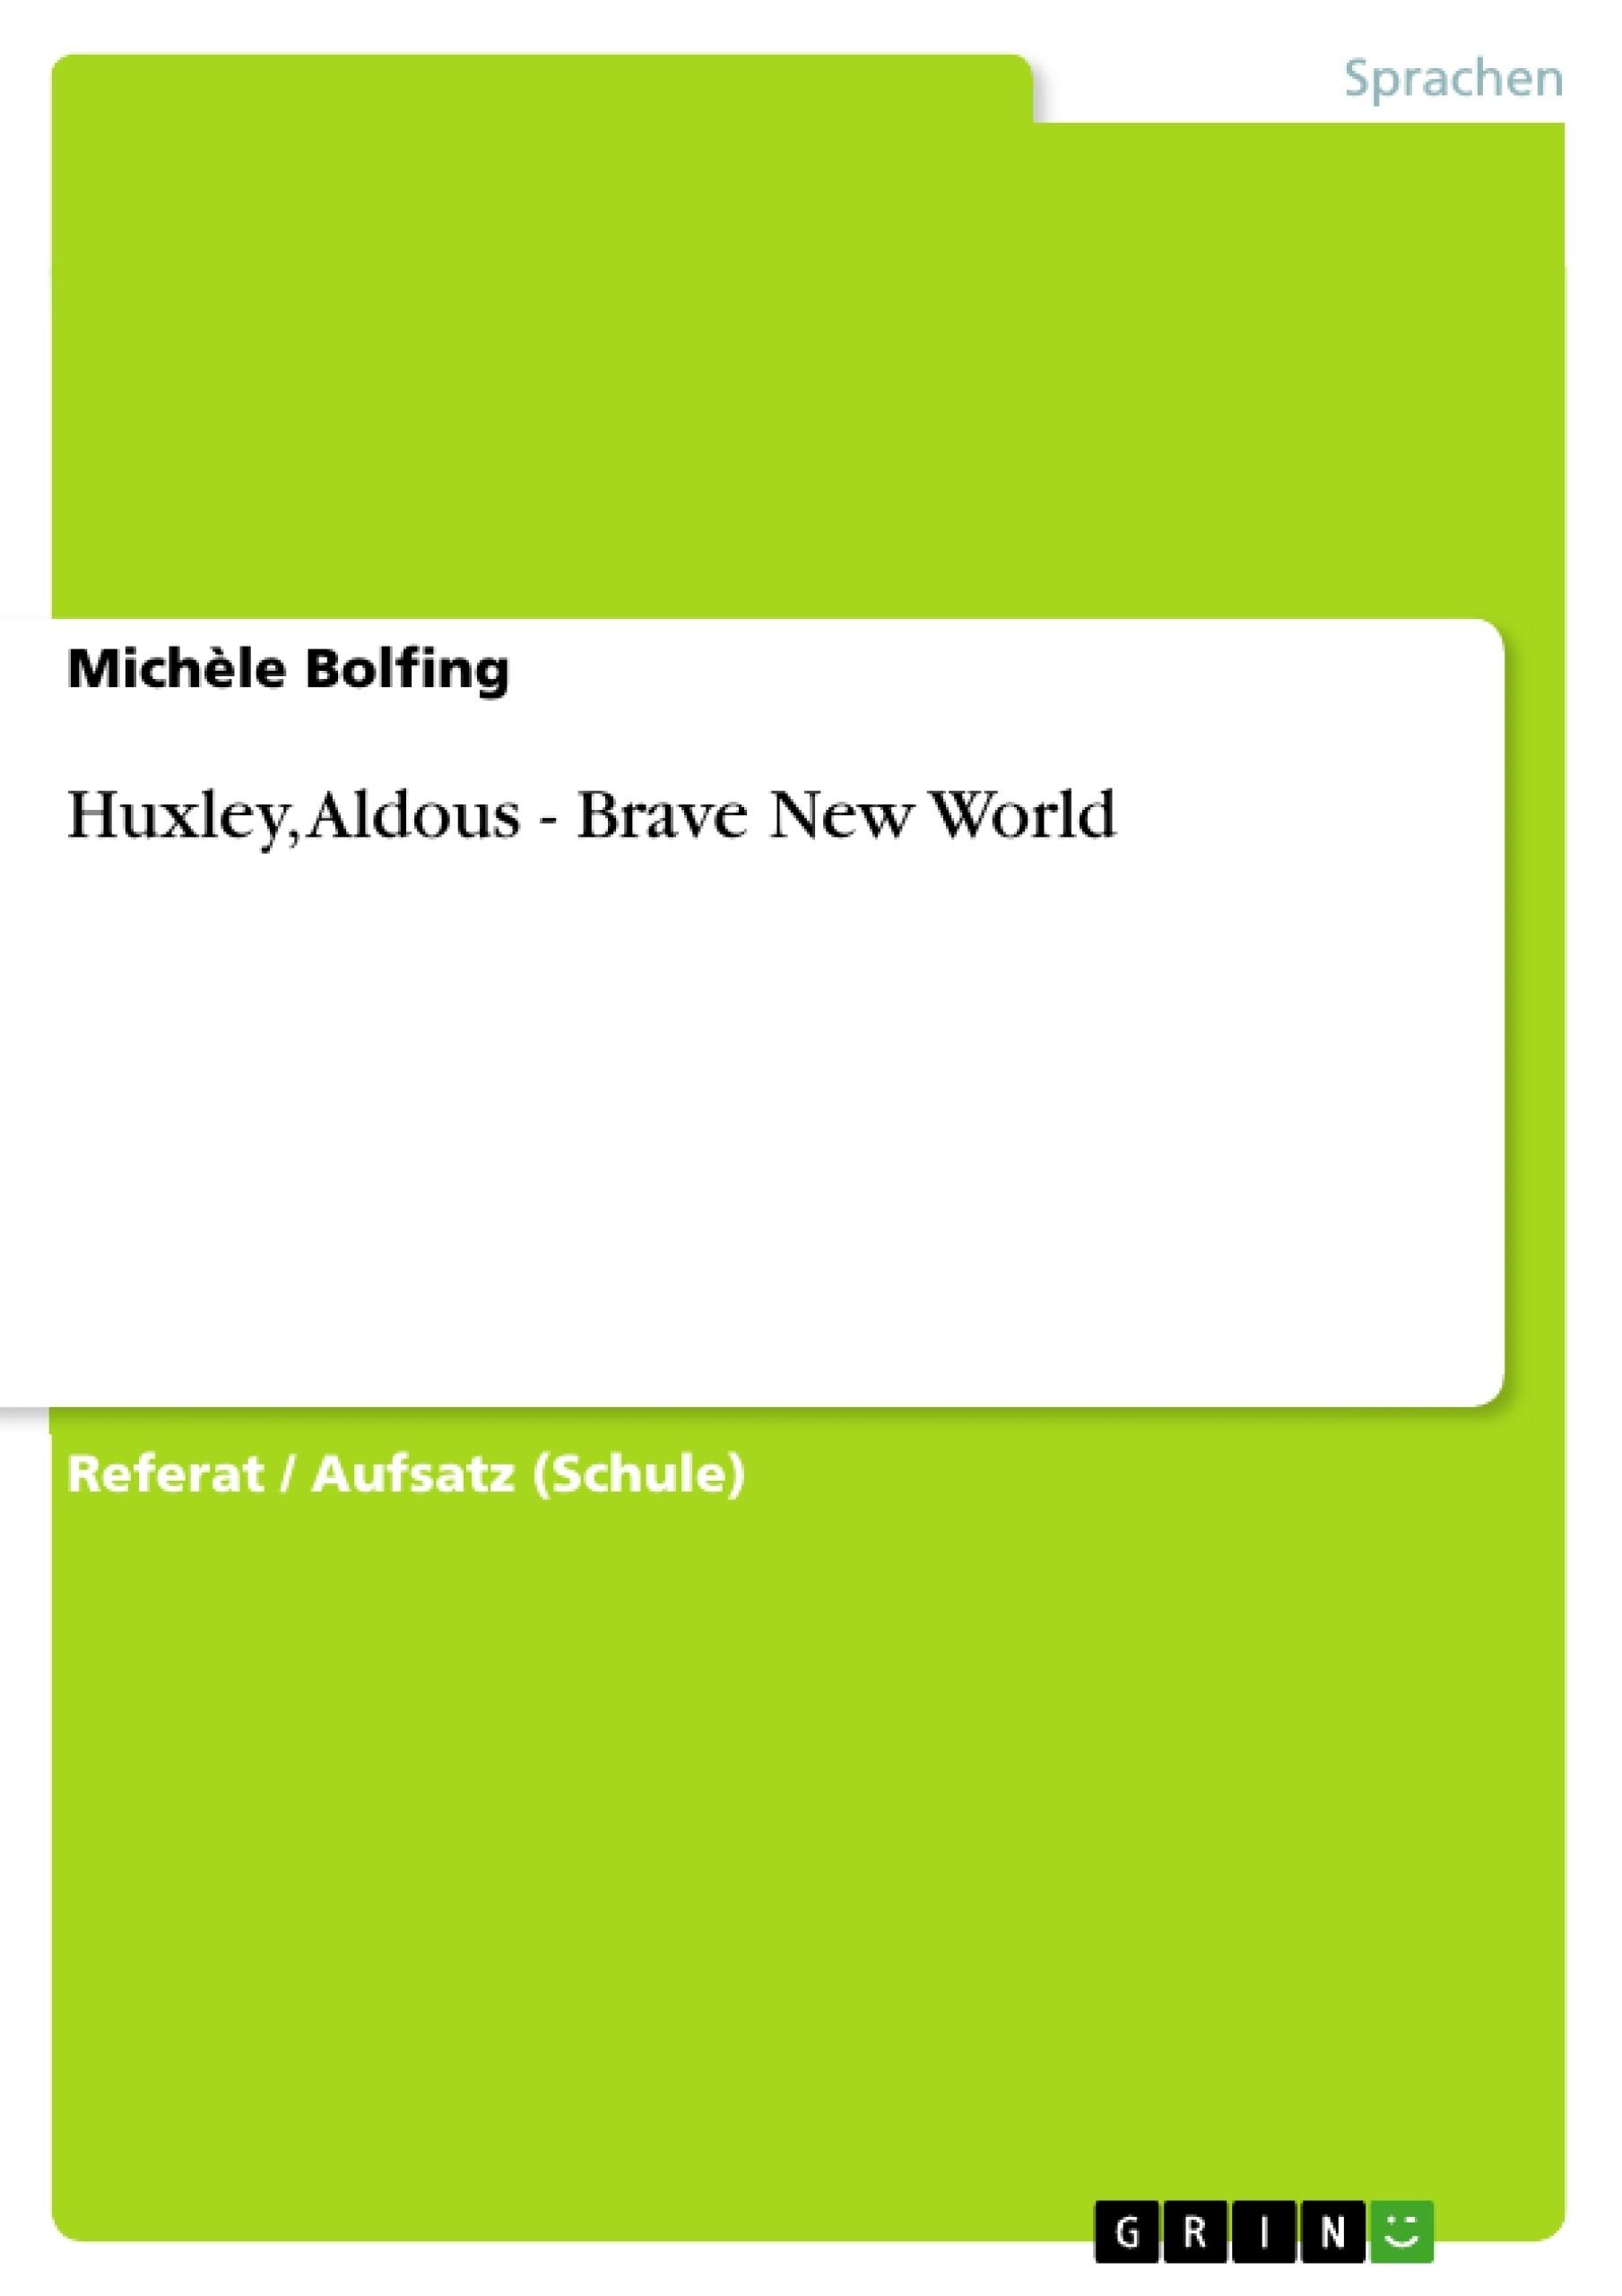 Titel: Huxley, Aldous - Brave New World